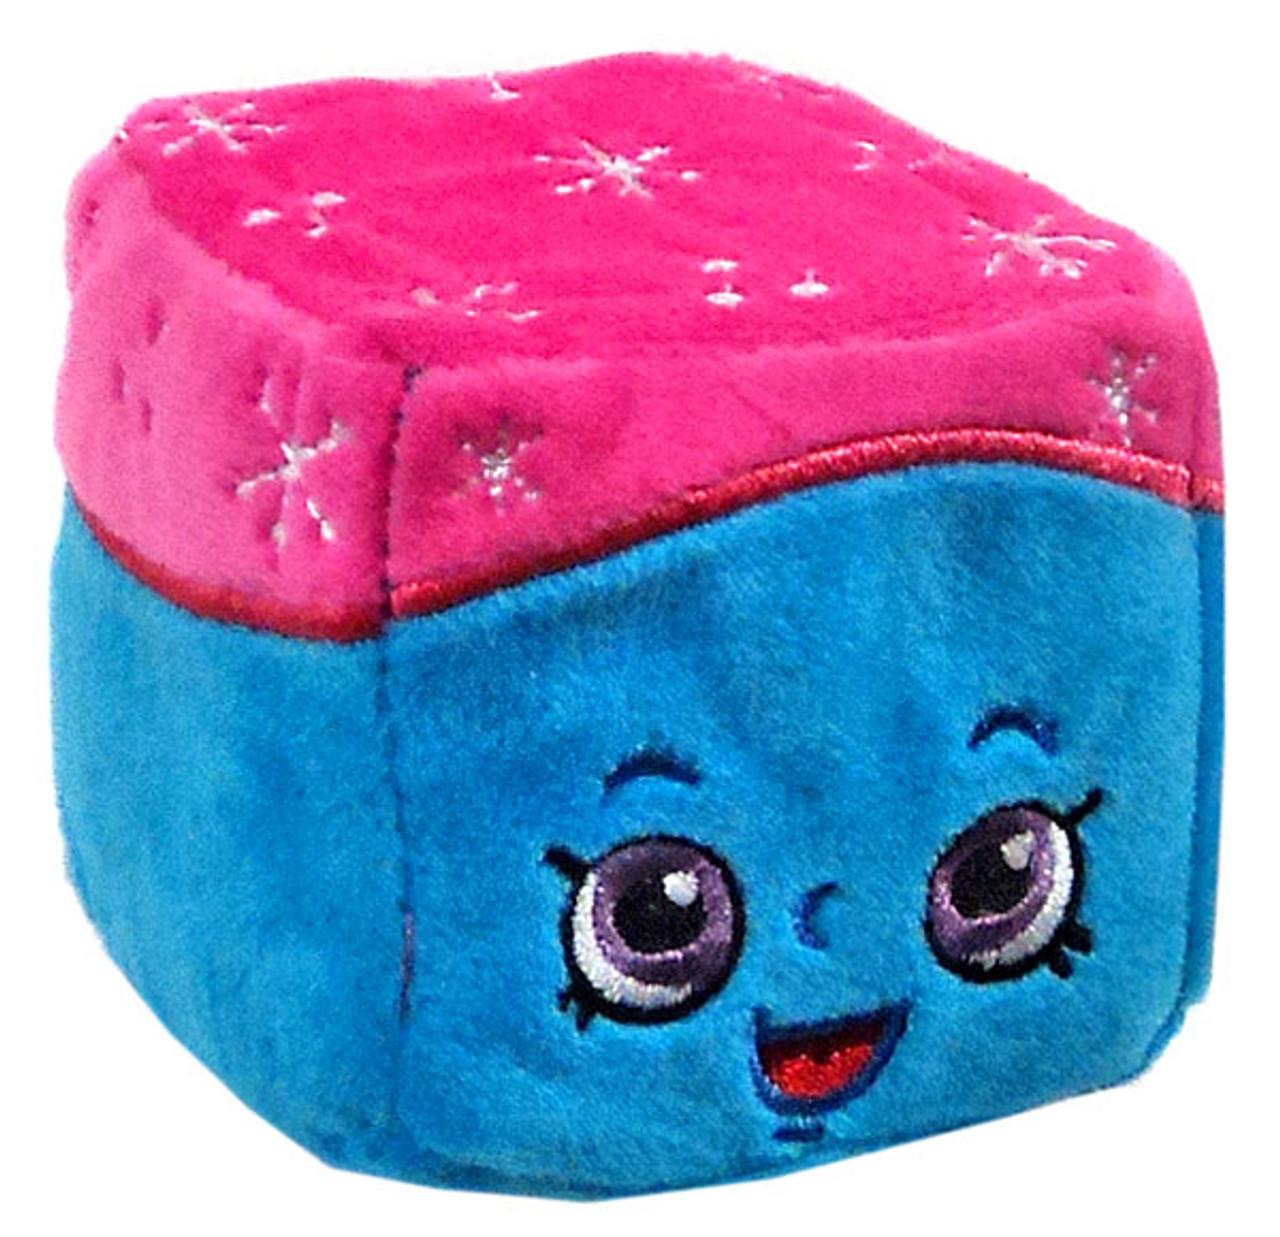 Shopkins Cuddle Cubes Snow Crush 3 Inch Plush